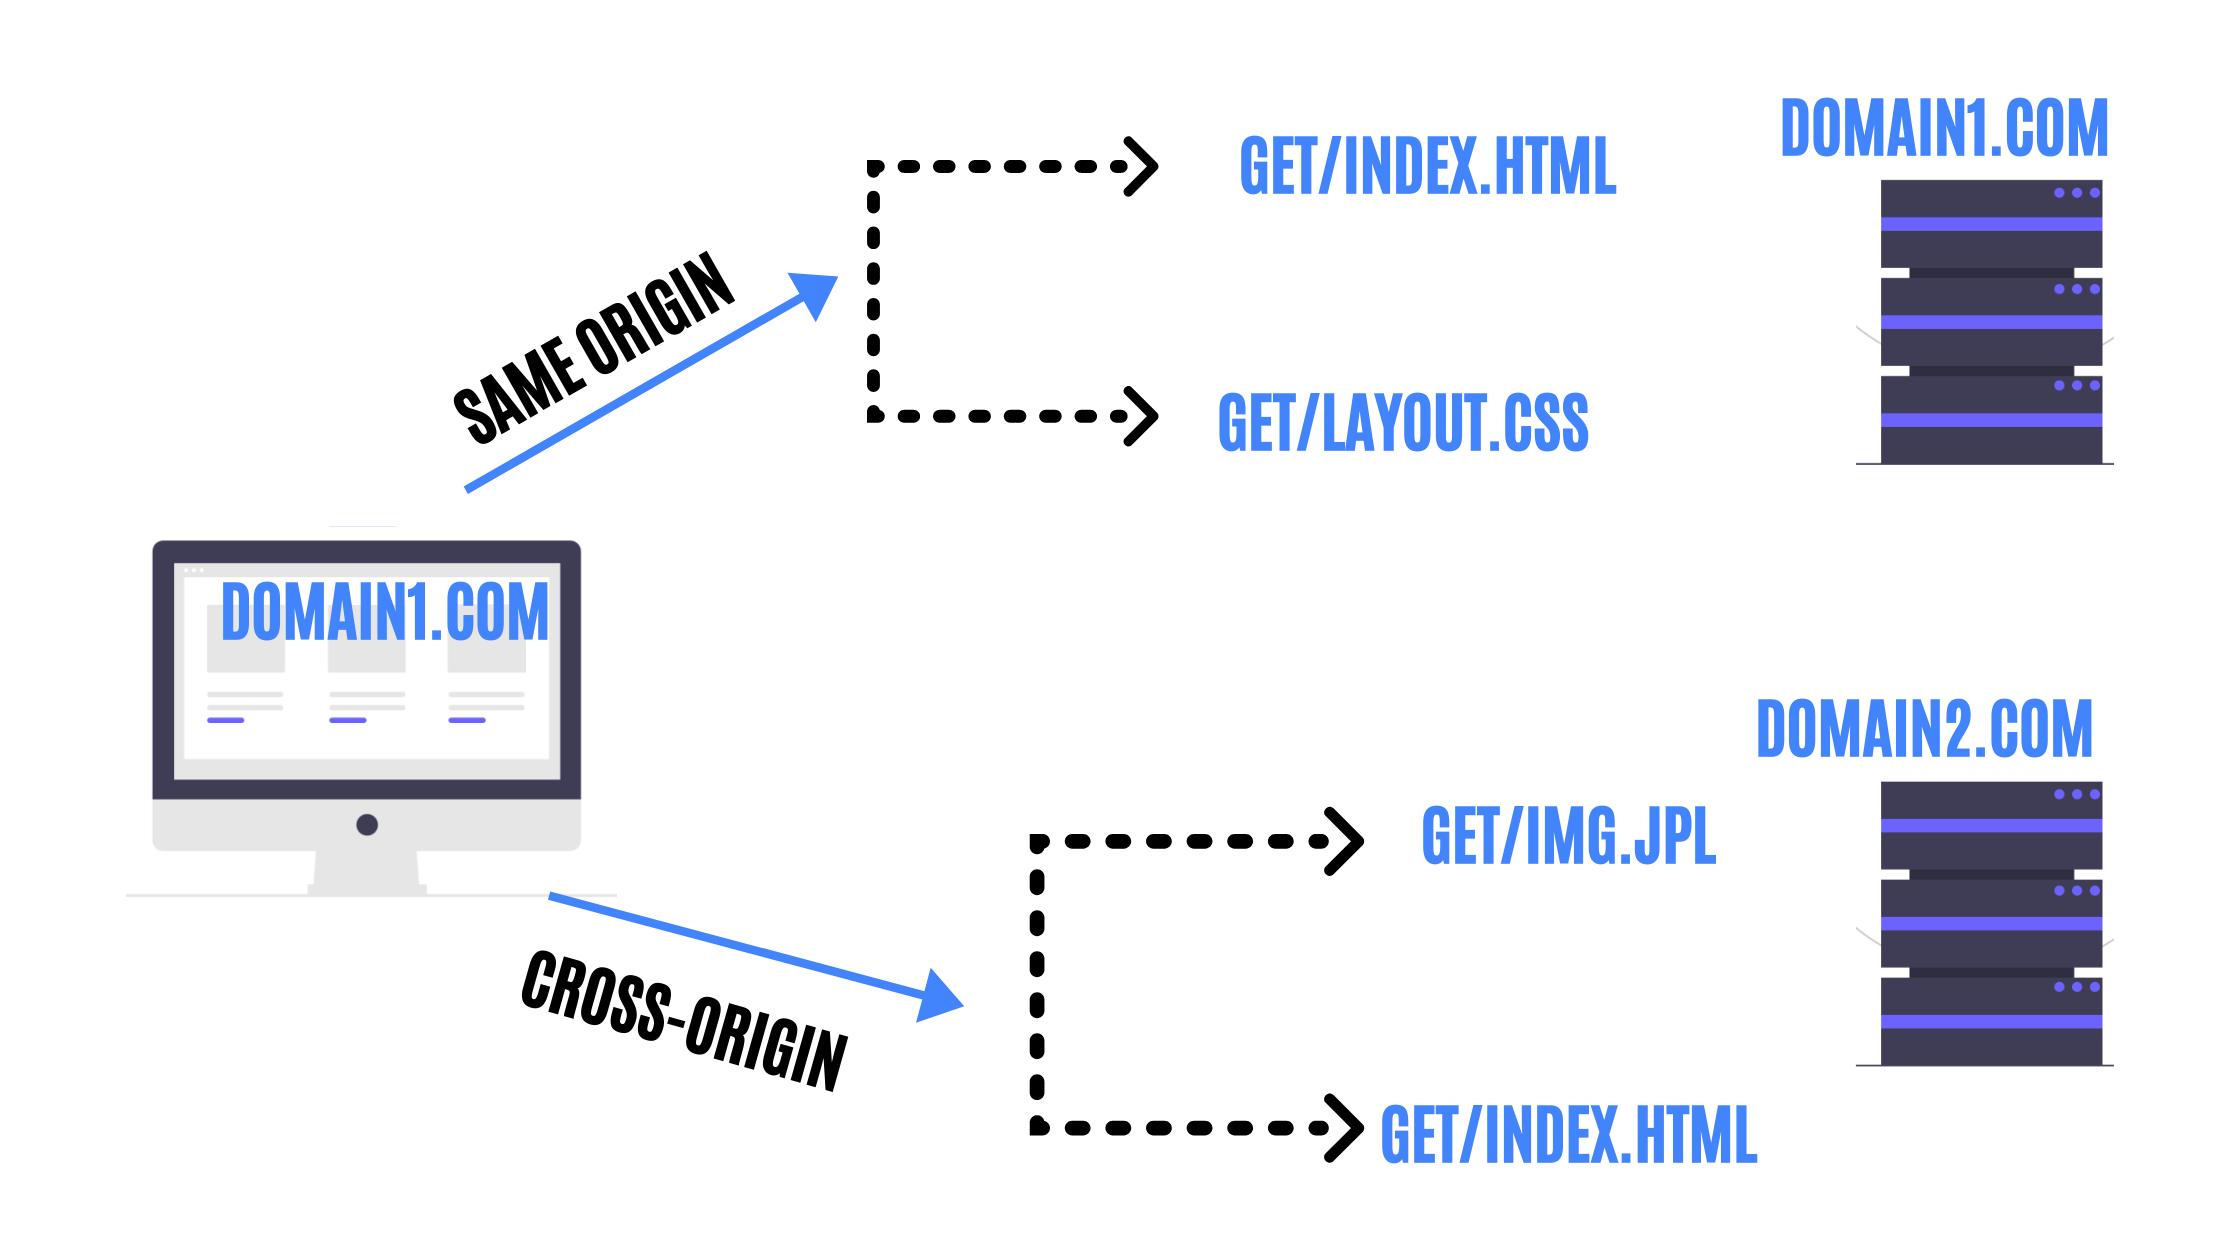 What is Cross-Origin Resource Sharing